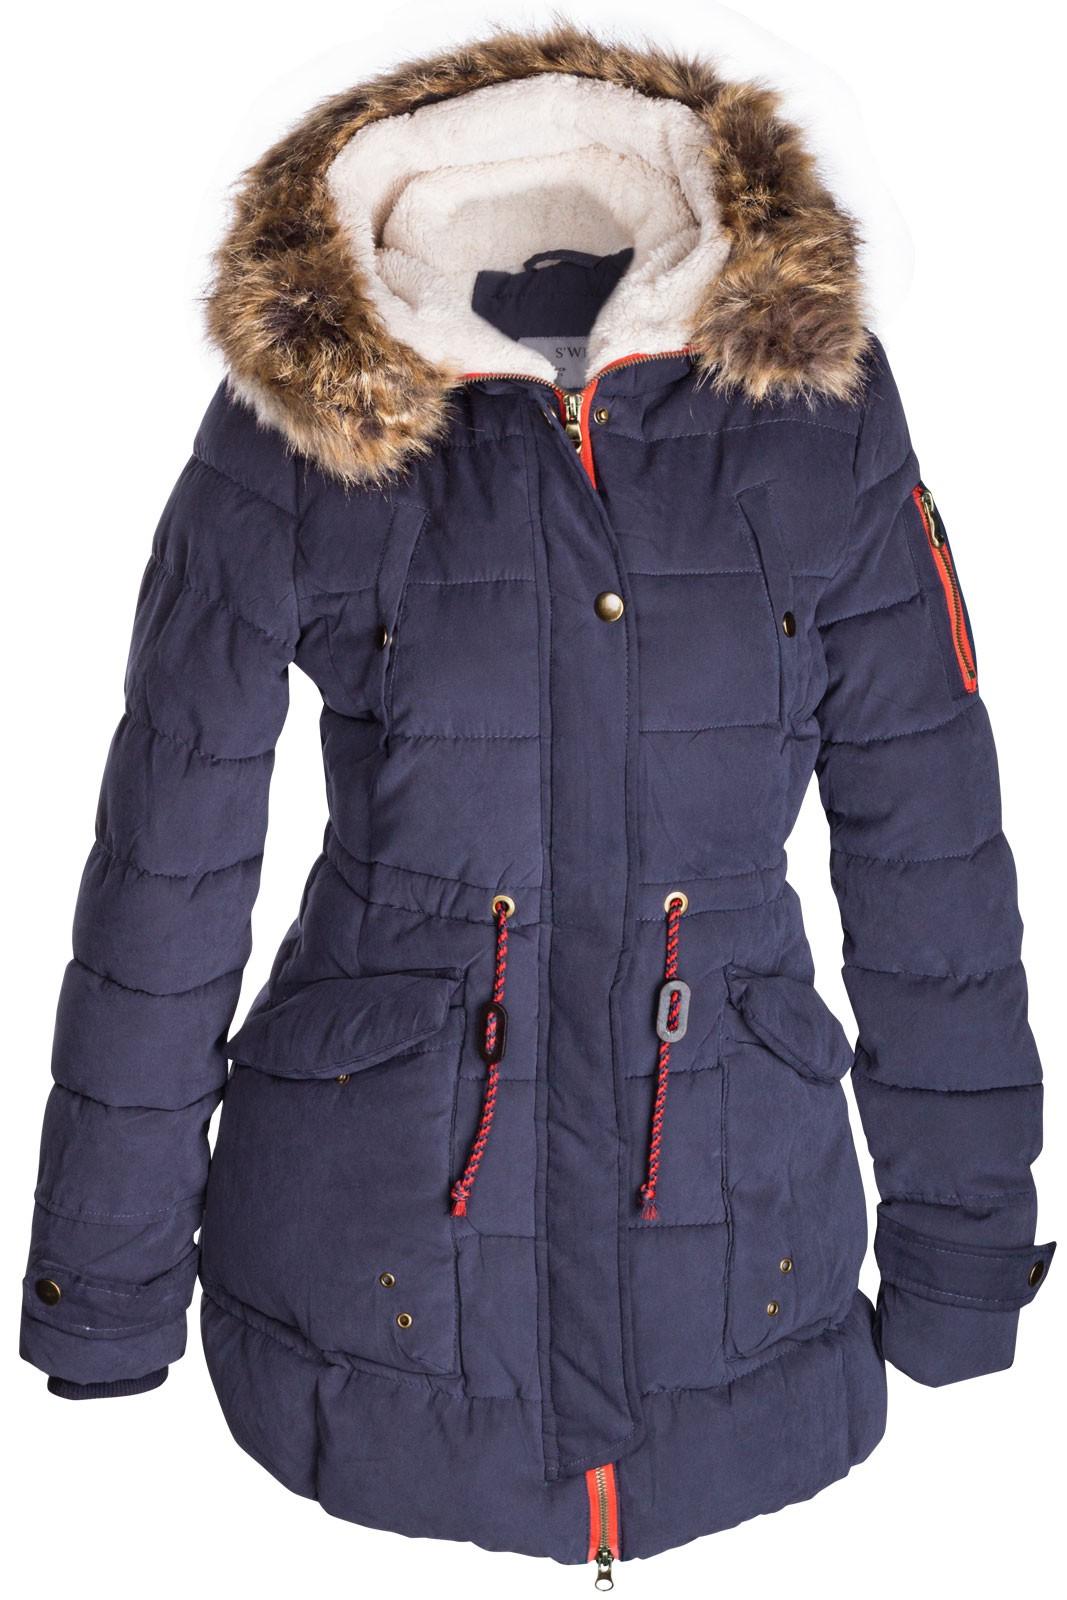 damen winter mantel jacke fell 2 in 1 kapuze stepp parka lang pelz alaska ebay. Black Bedroom Furniture Sets. Home Design Ideas